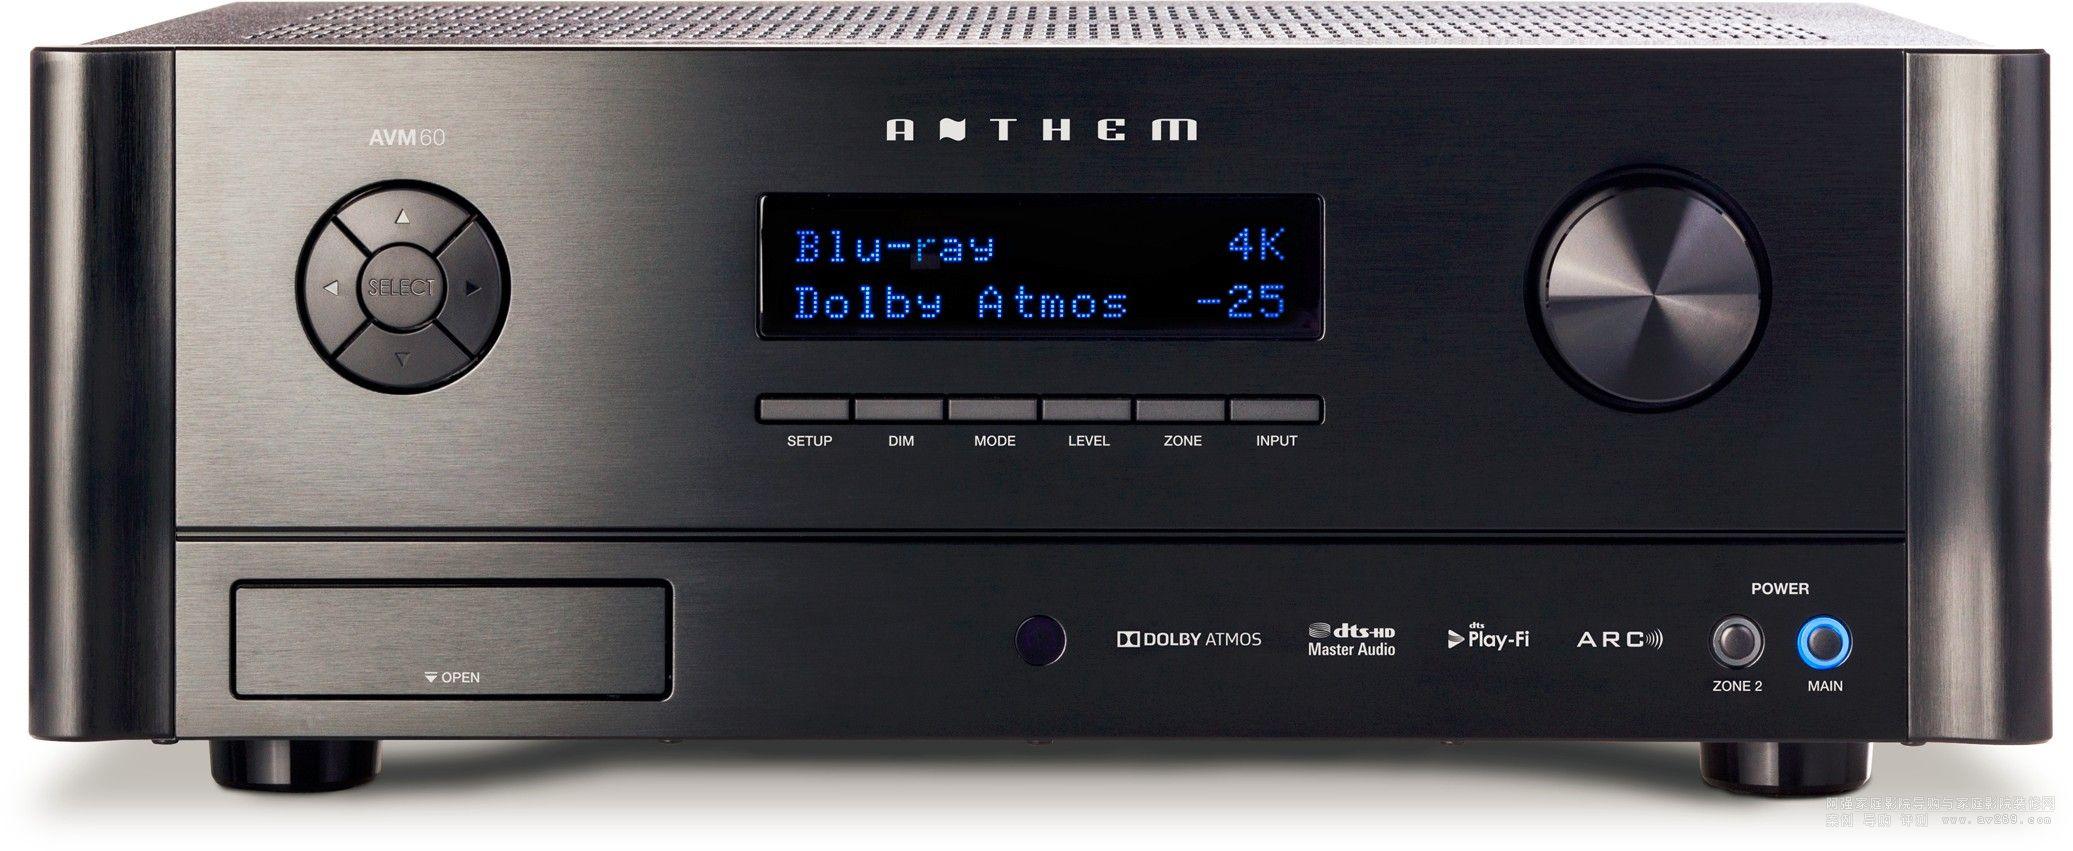 Anthem AVM60